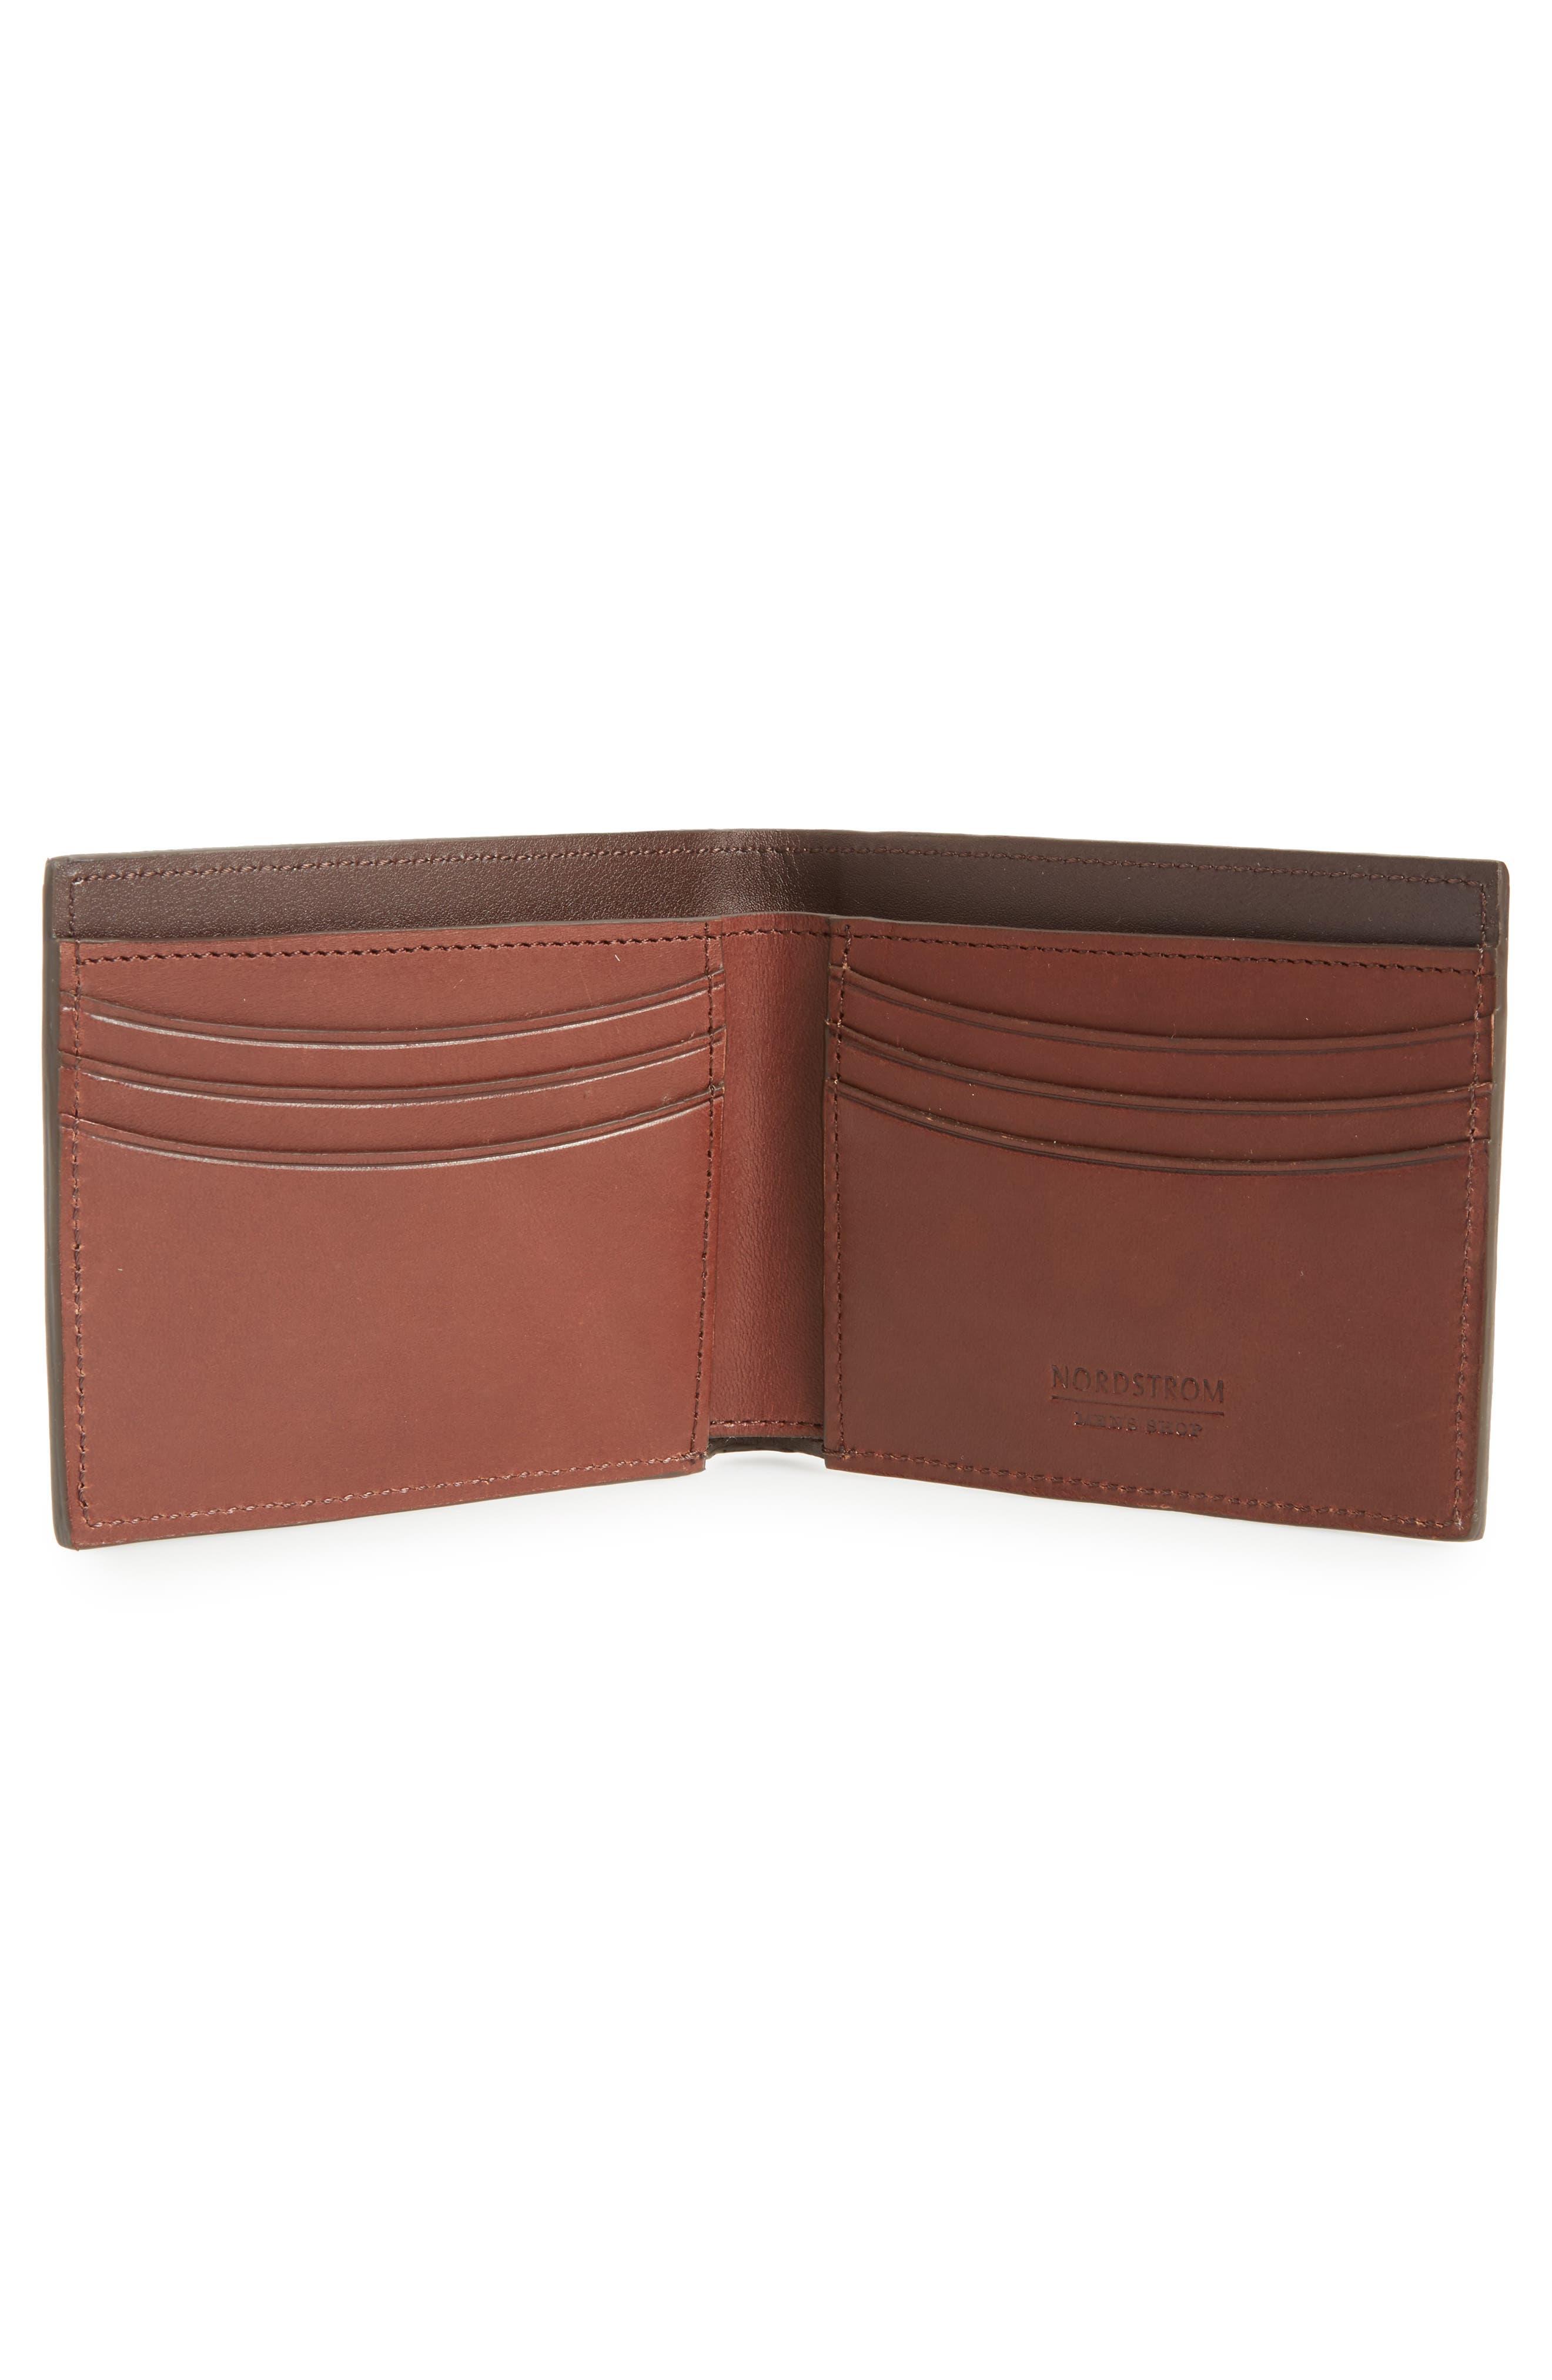 Parker Leather Wallet,                             Alternate thumbnail 2, color,                             210